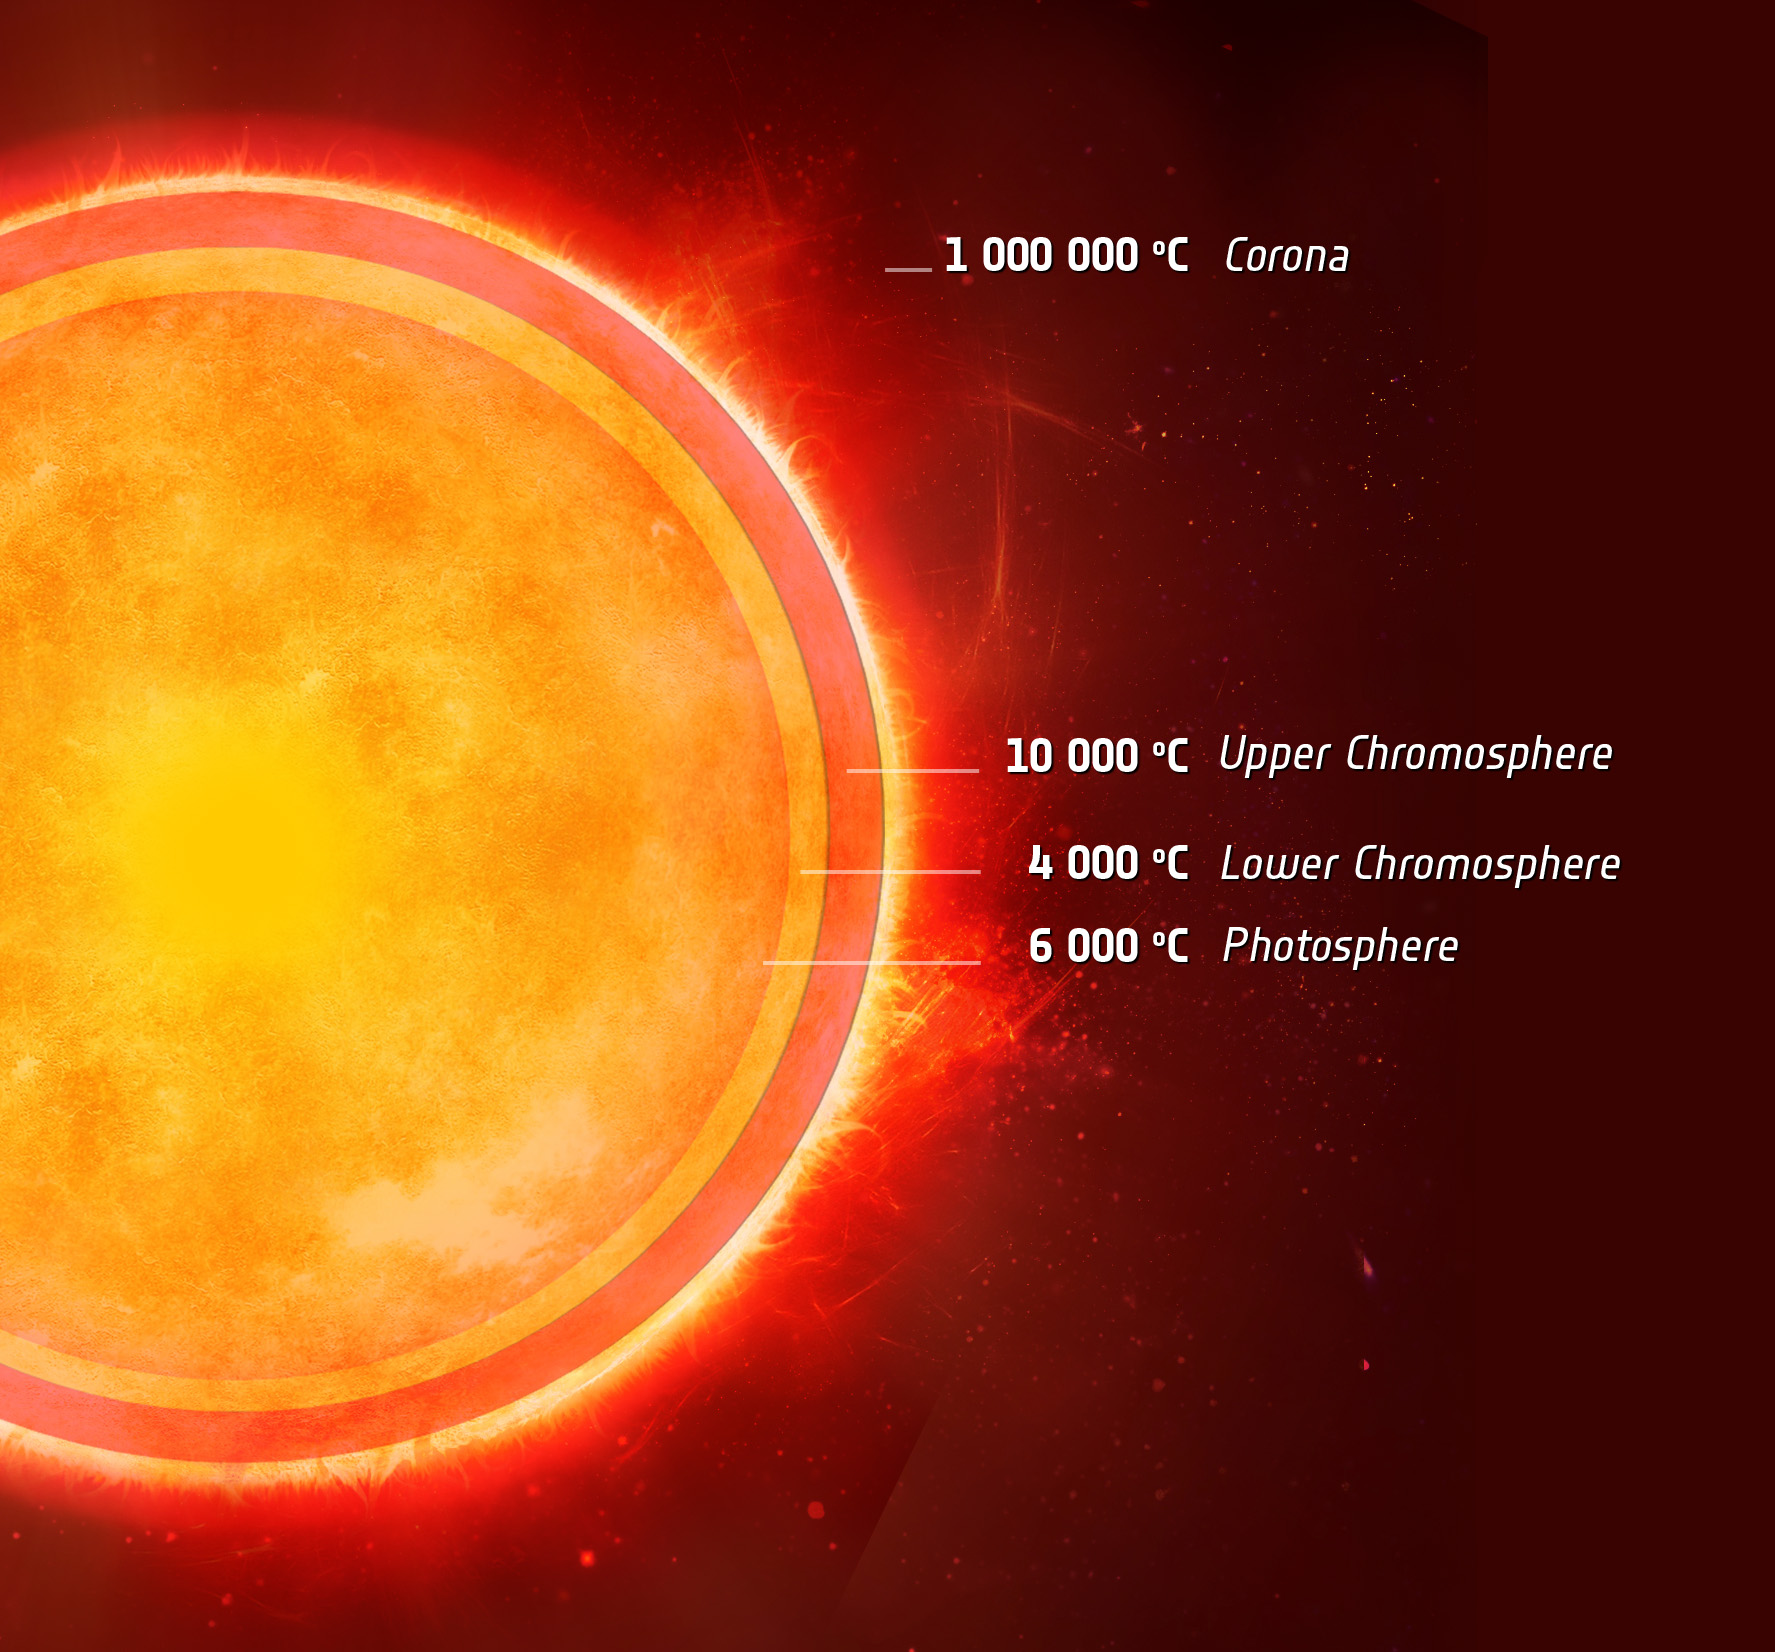 1567216759510-Sun-like-star_temperatures.jpg